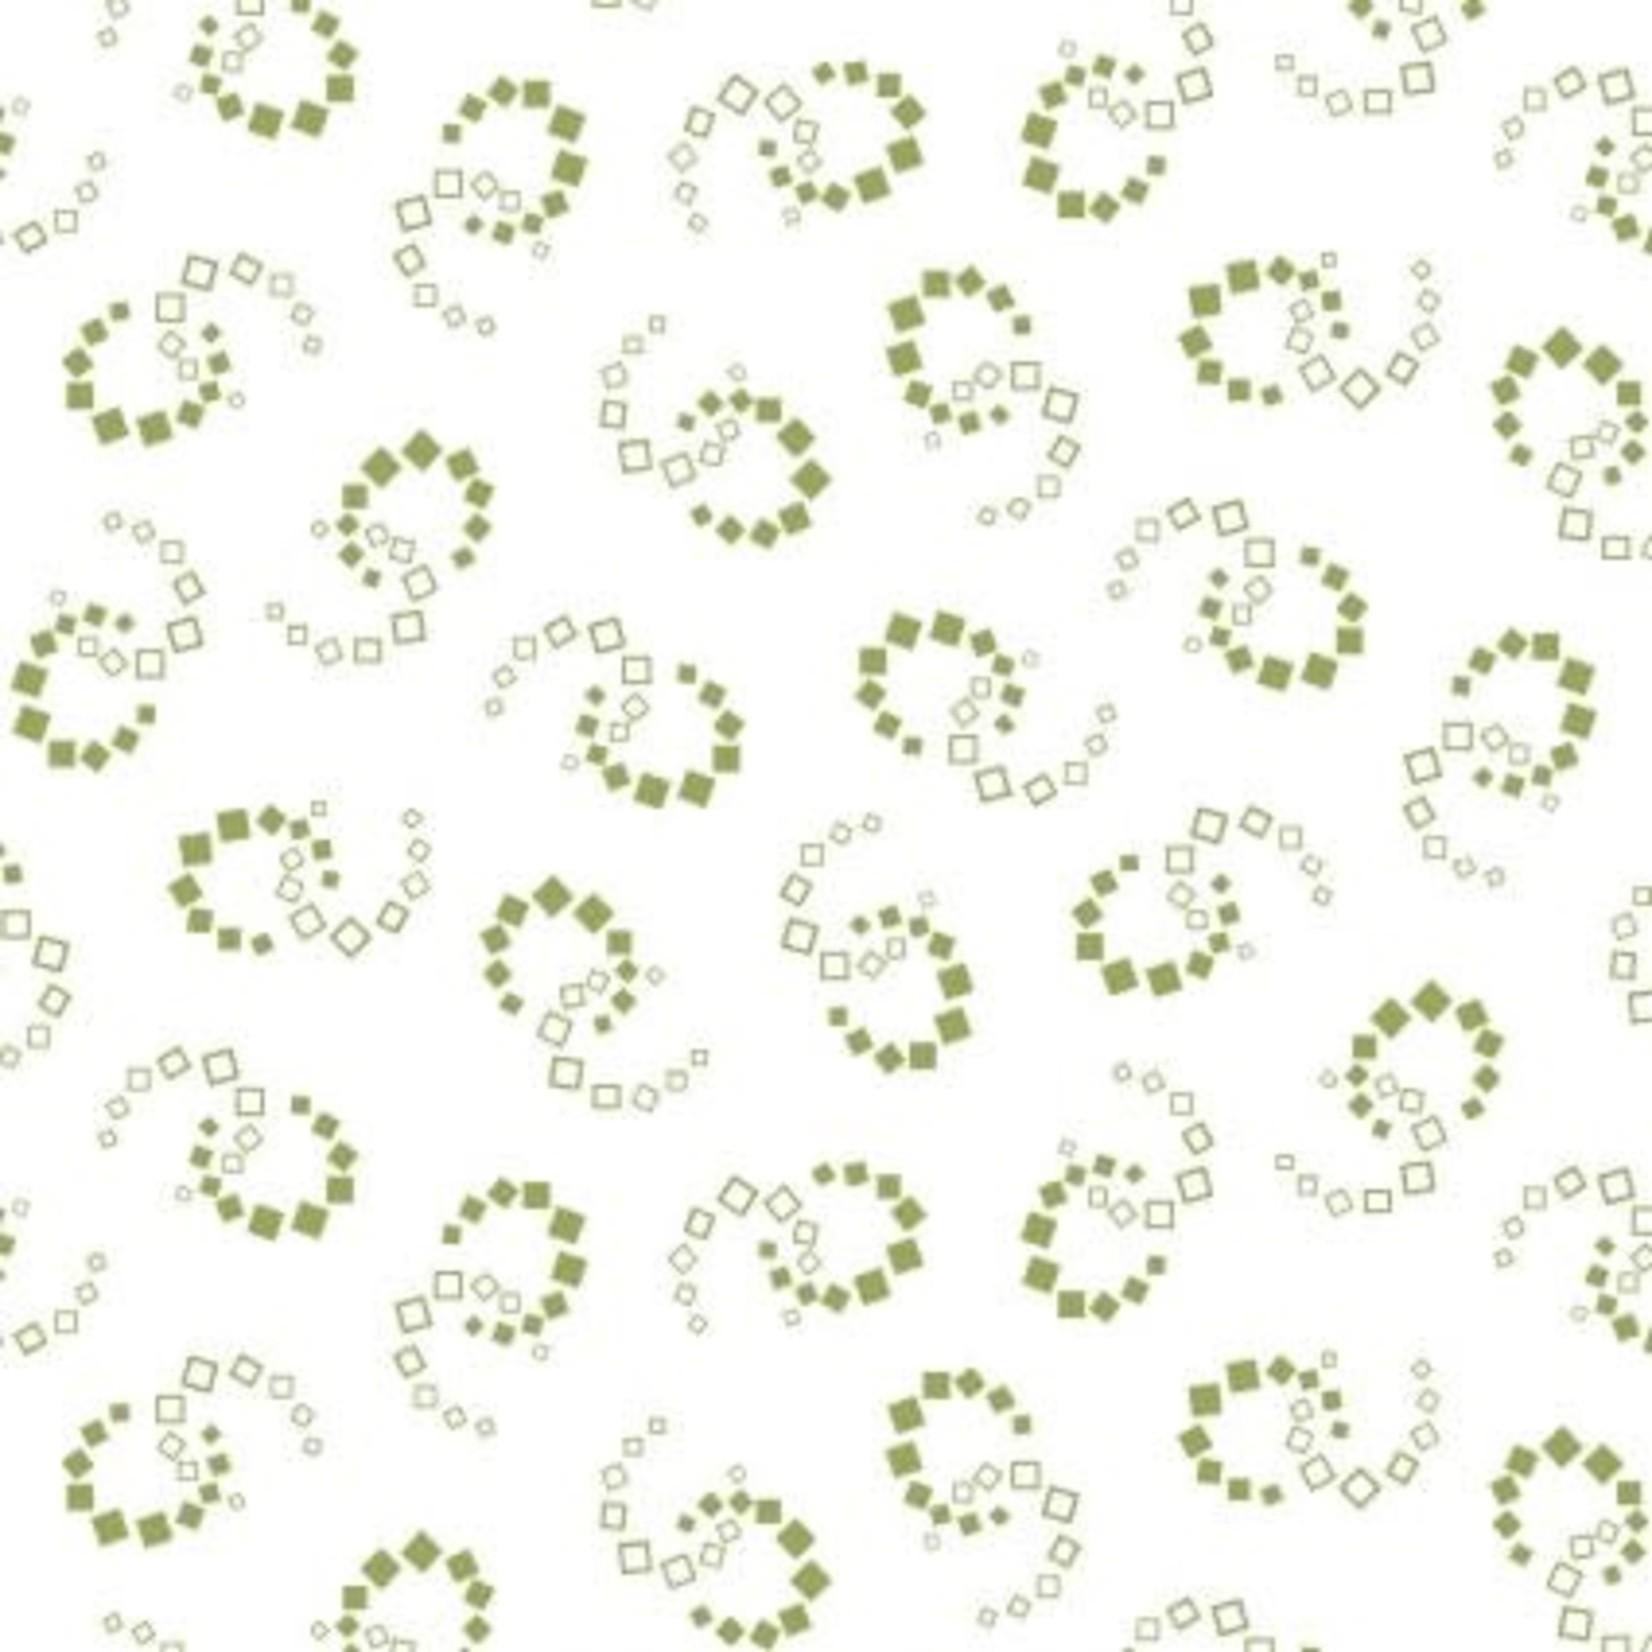 Maywood Carnaby Geometric Swirl White Green, /CM OR $18/M